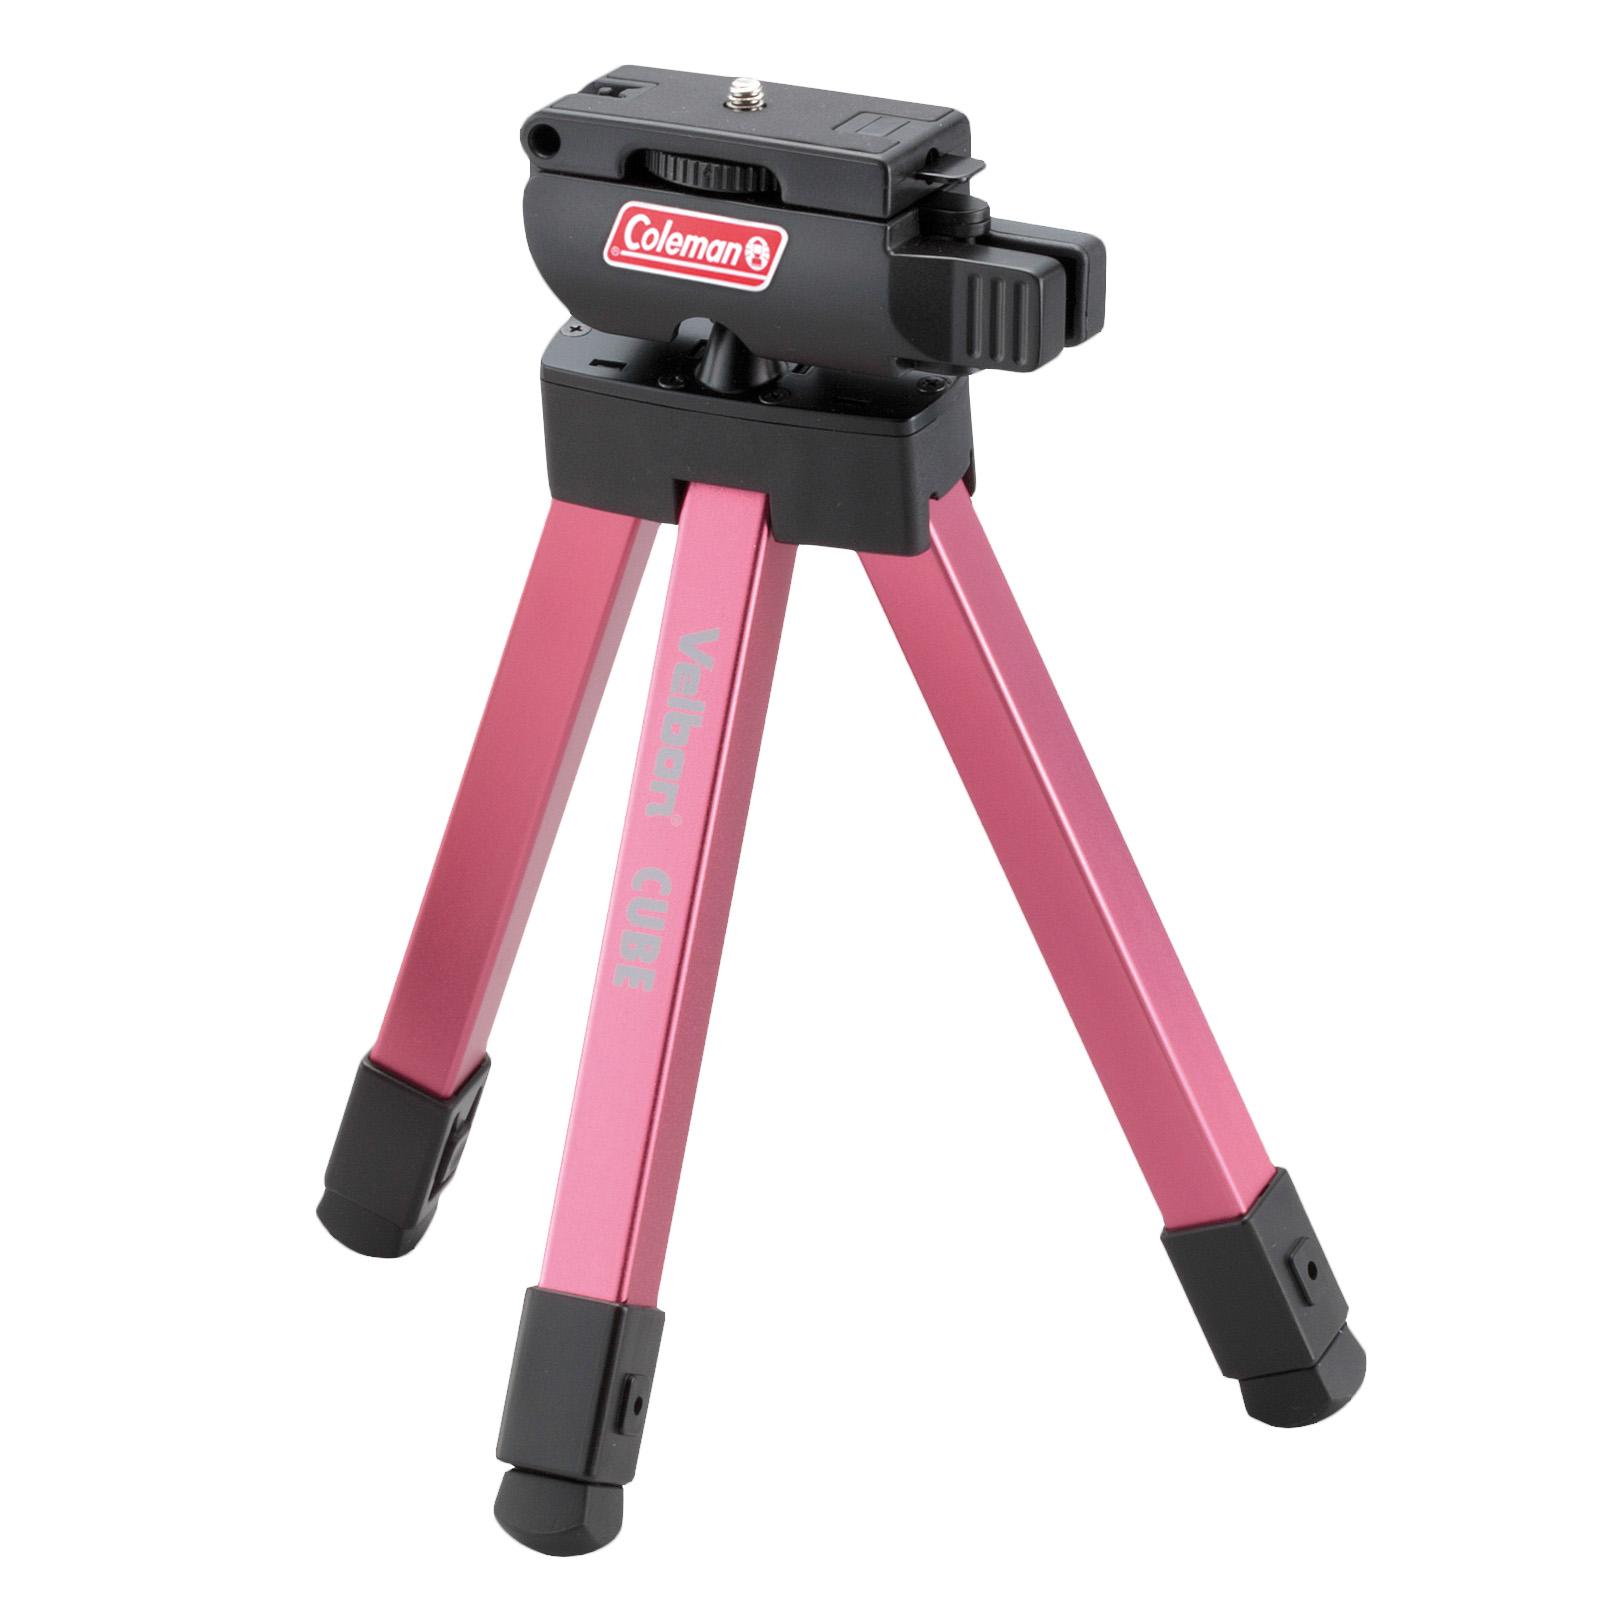 【B級品】 キューブ プラス ピンク